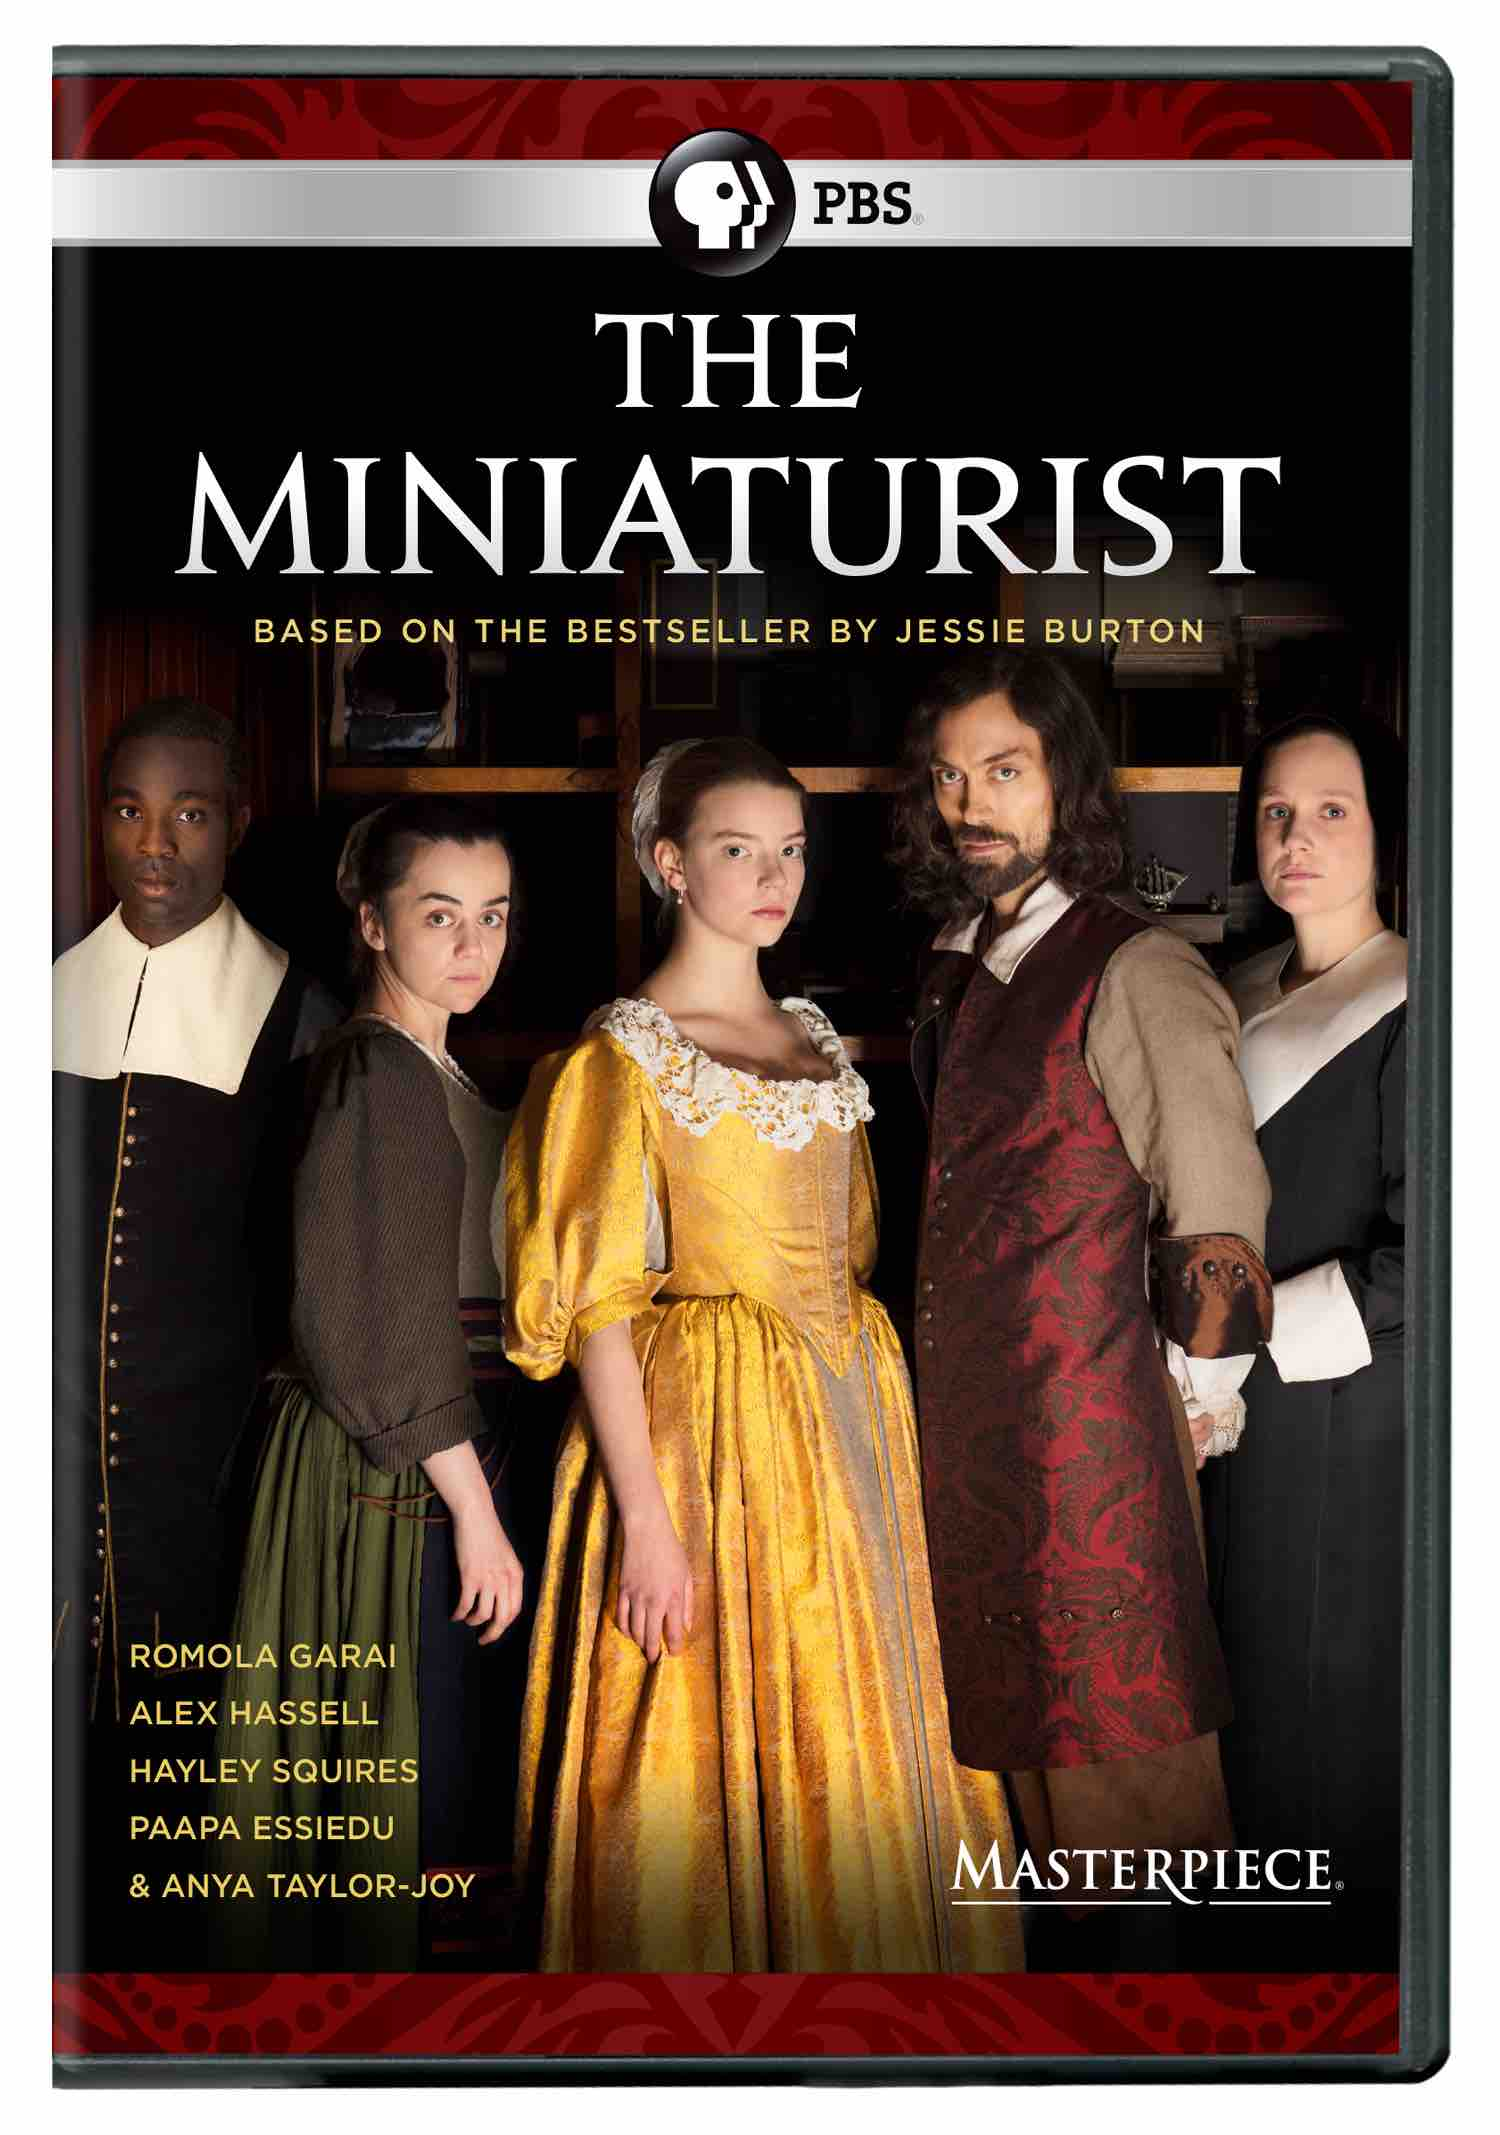 The Miniaturist DVD cover